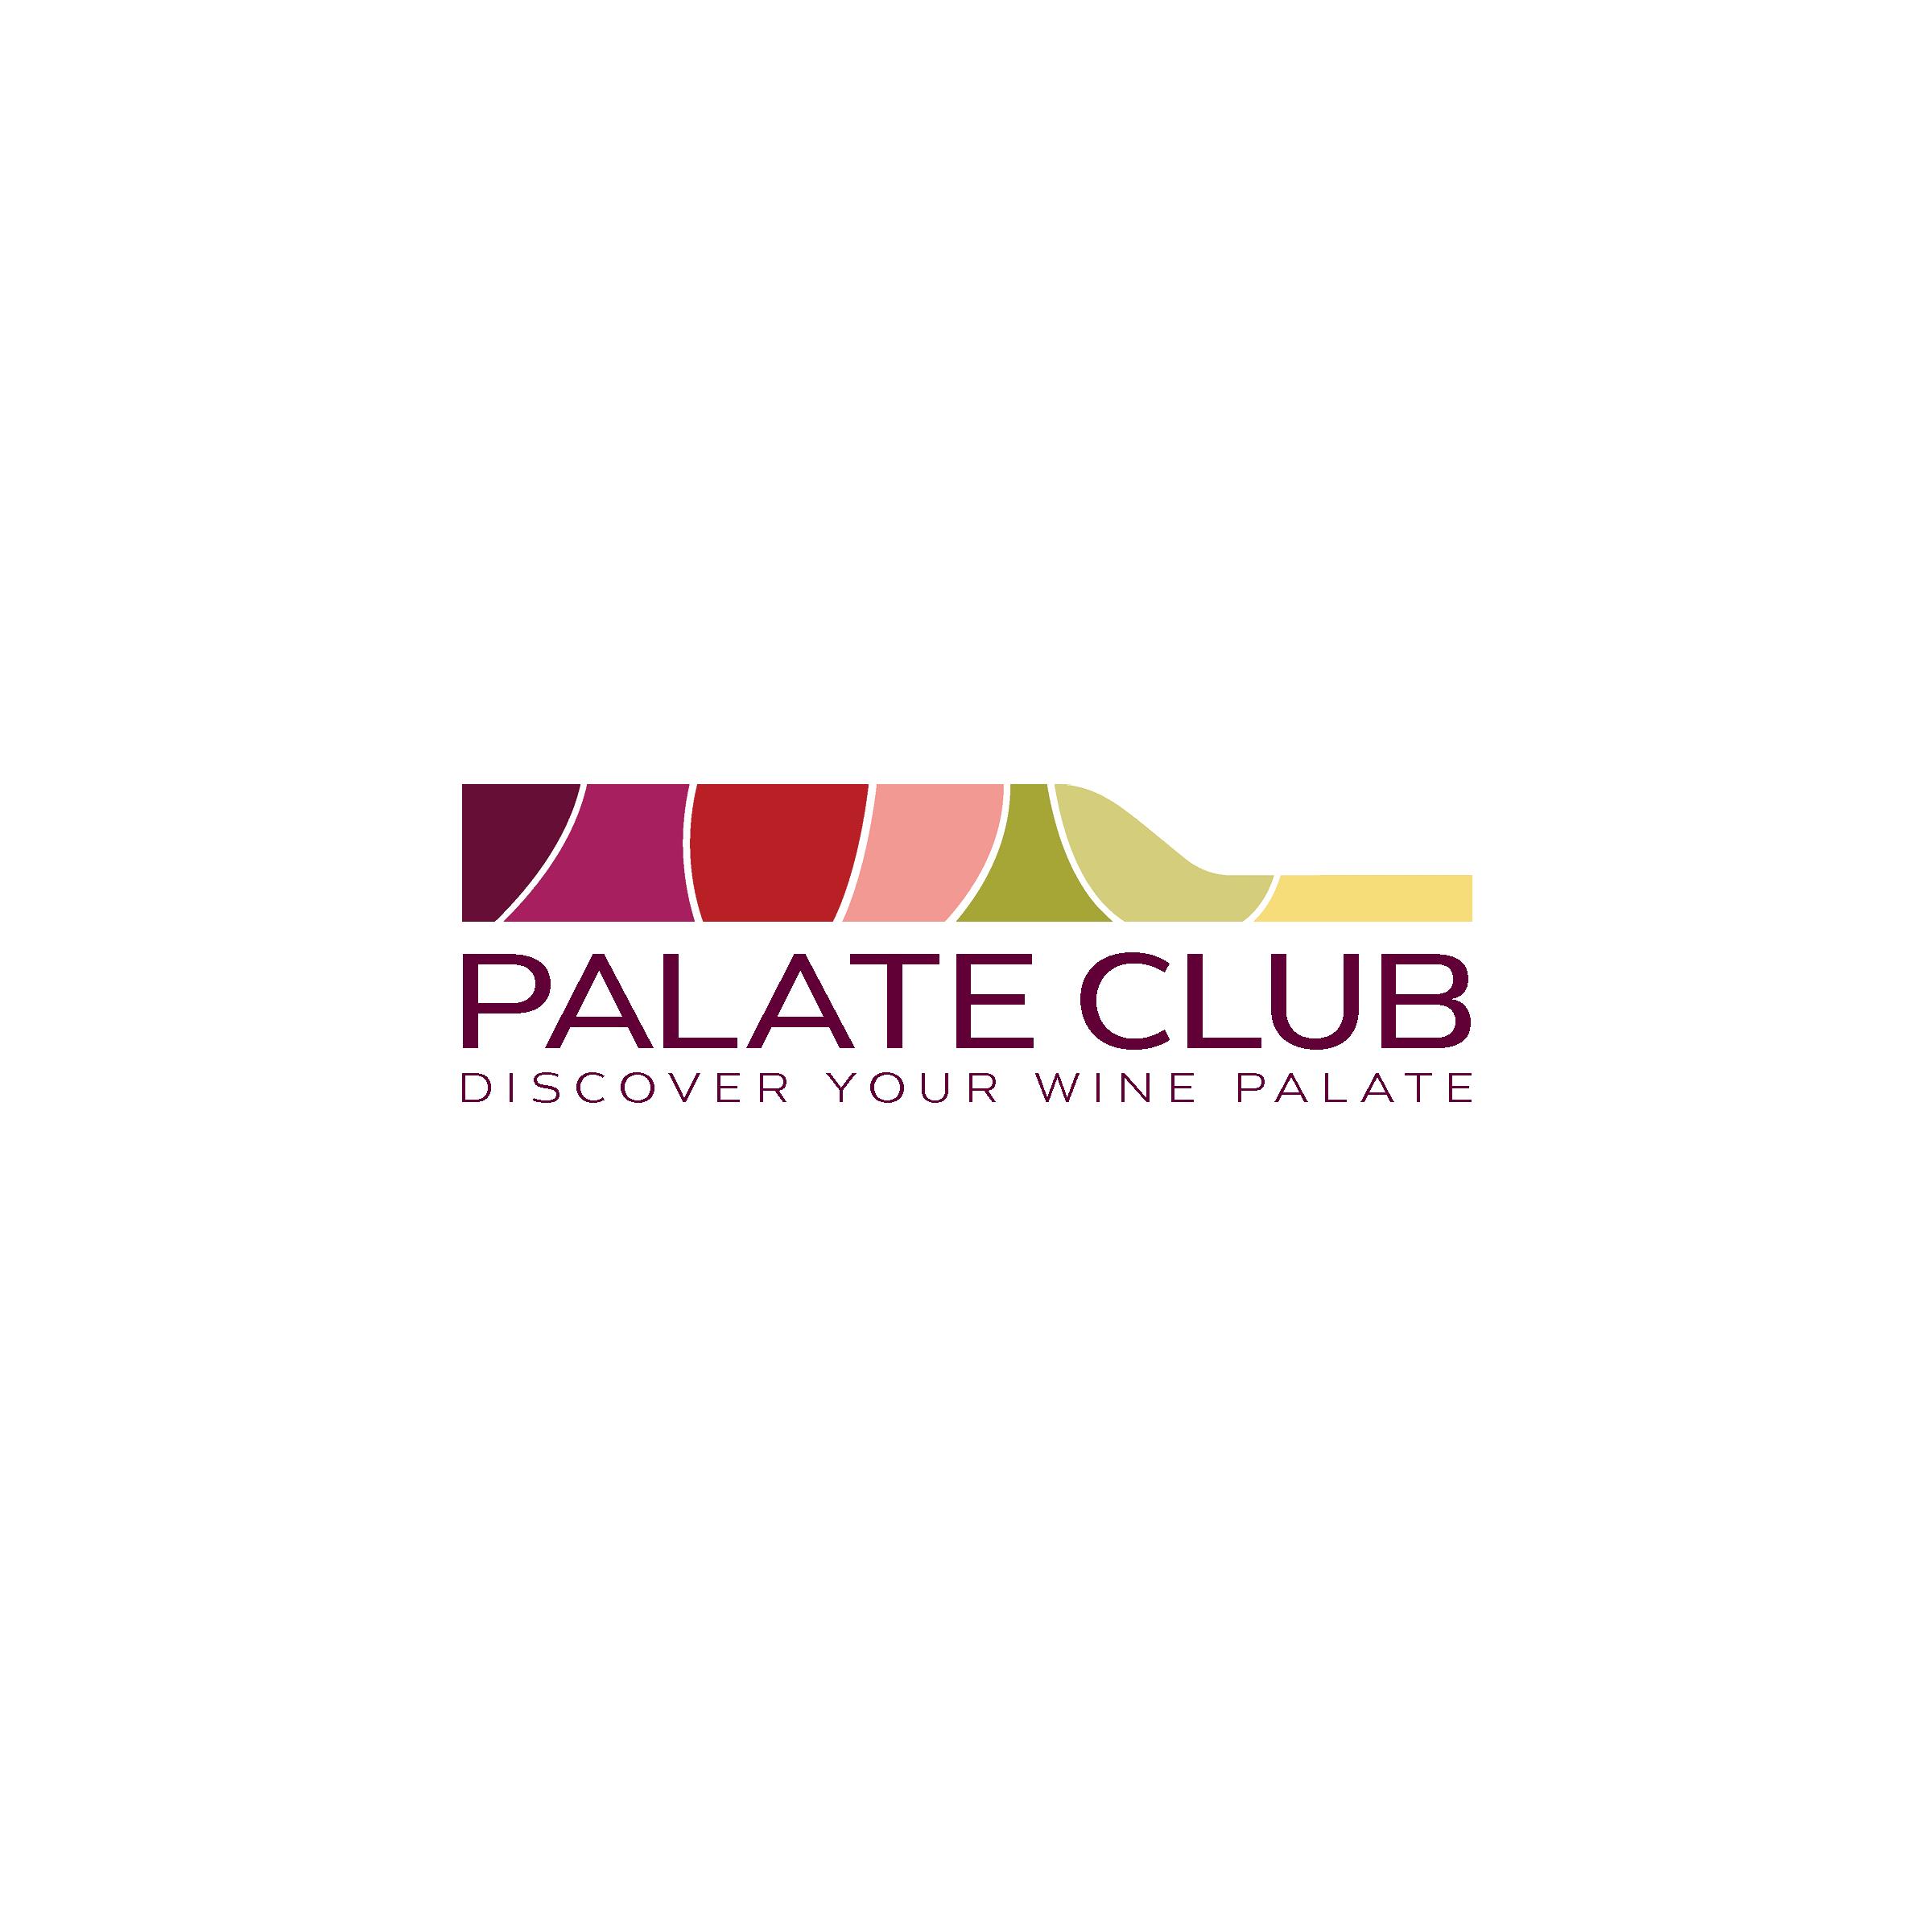 Palate Club